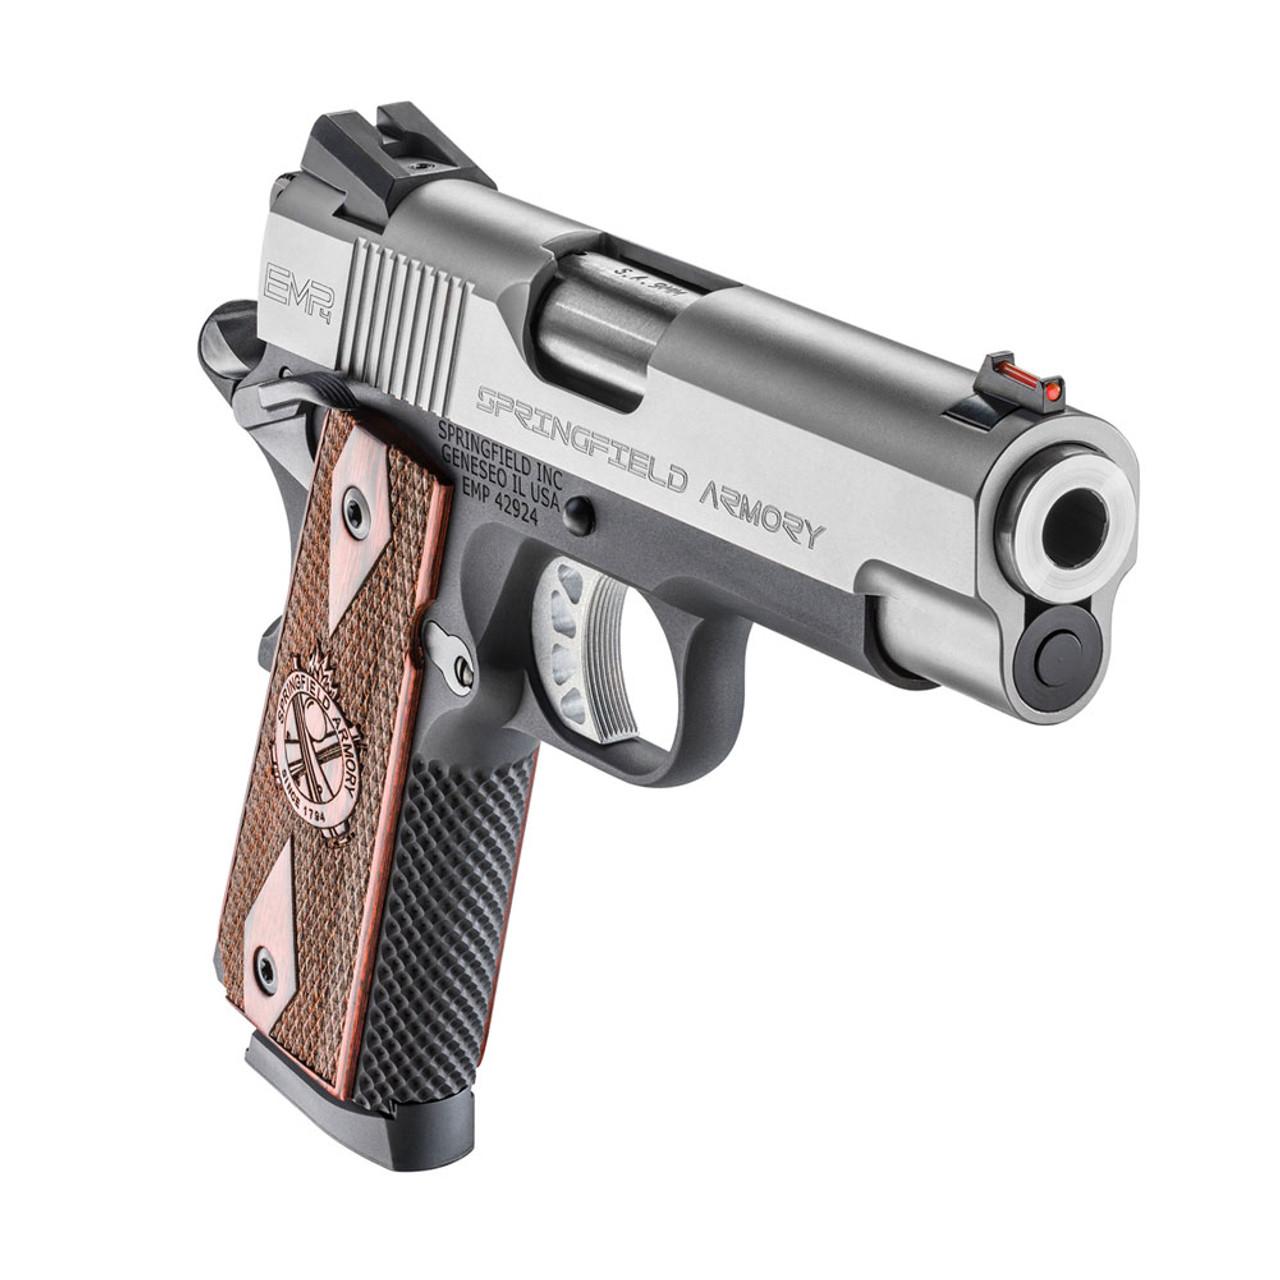 SPRINGFIELD ARMORY 1911-A1 EMP Lightweight Champion 9mm 4in 10rd  Semi-Automatic Pistol (PI9211L)